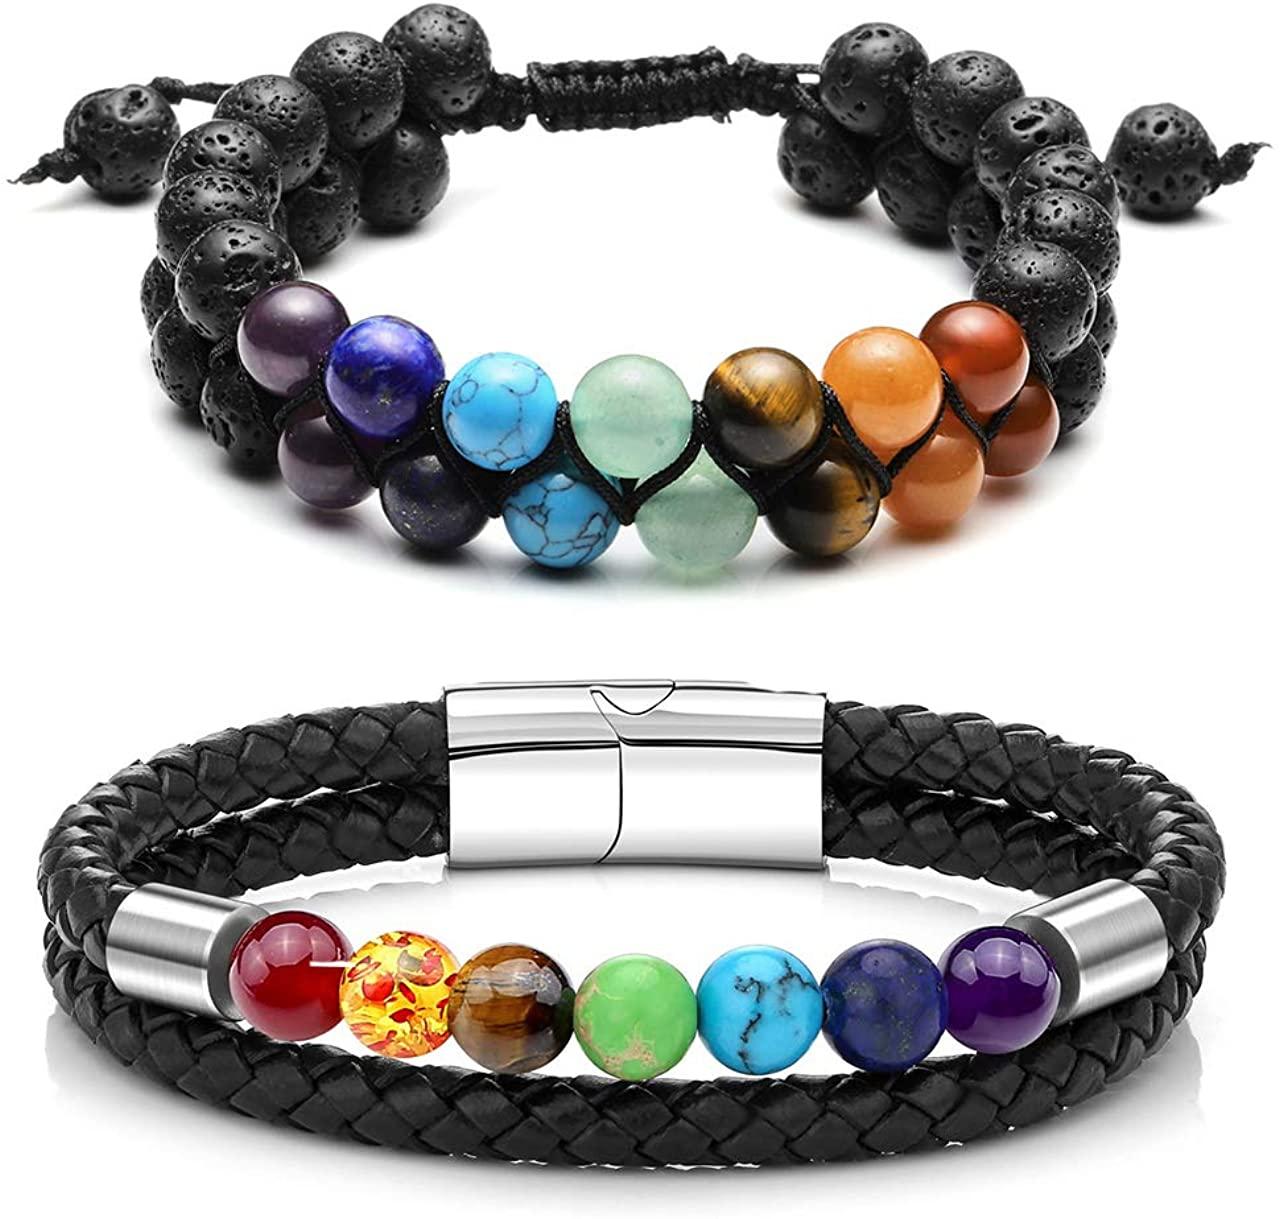 Jovivi 2 Pcs Bead Bracelet for Men Women Lava Rock Essential Oil Diffuser Bracelet Black Leather Natural Stone Beaded Bracelet Set Stainless Steel Cuff Bangle Adjustable